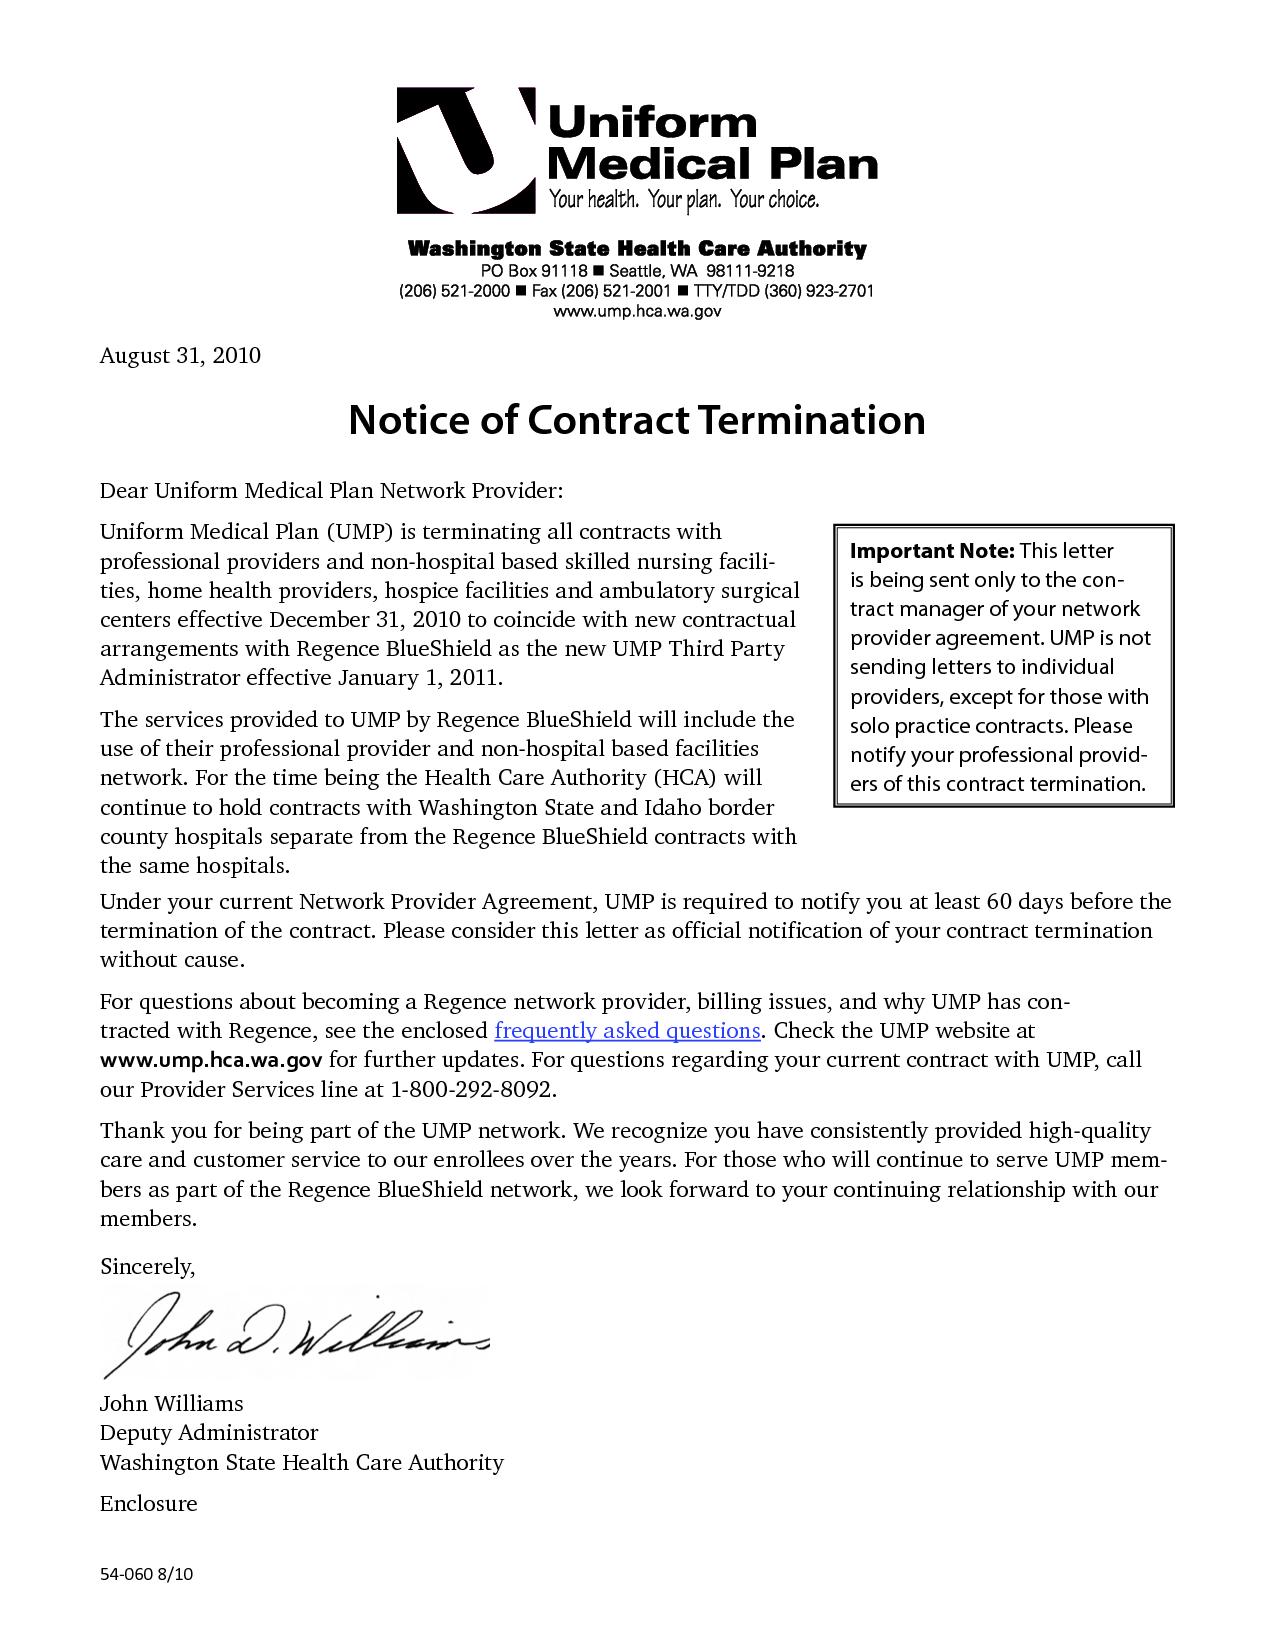 Insurance Renewal Letter Template Samples